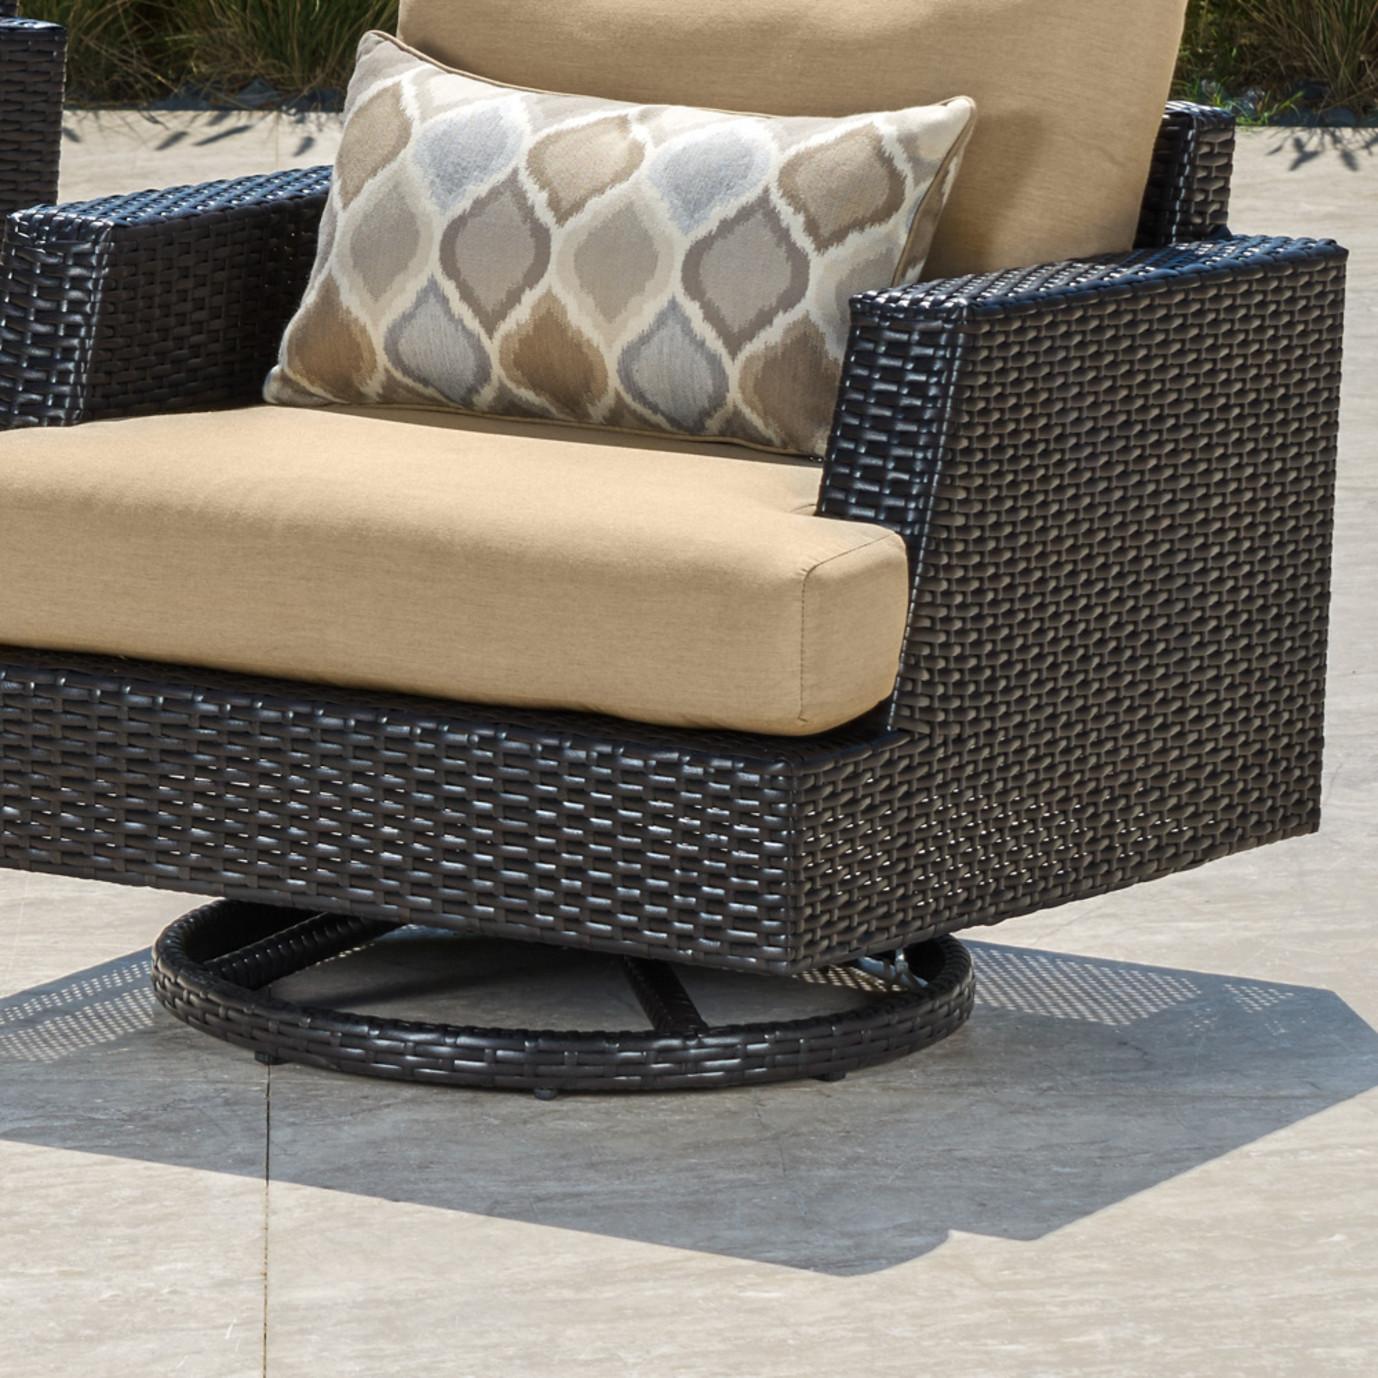 Portofino® Comfort 5pc Motion Club Chair Set - Heather Beige